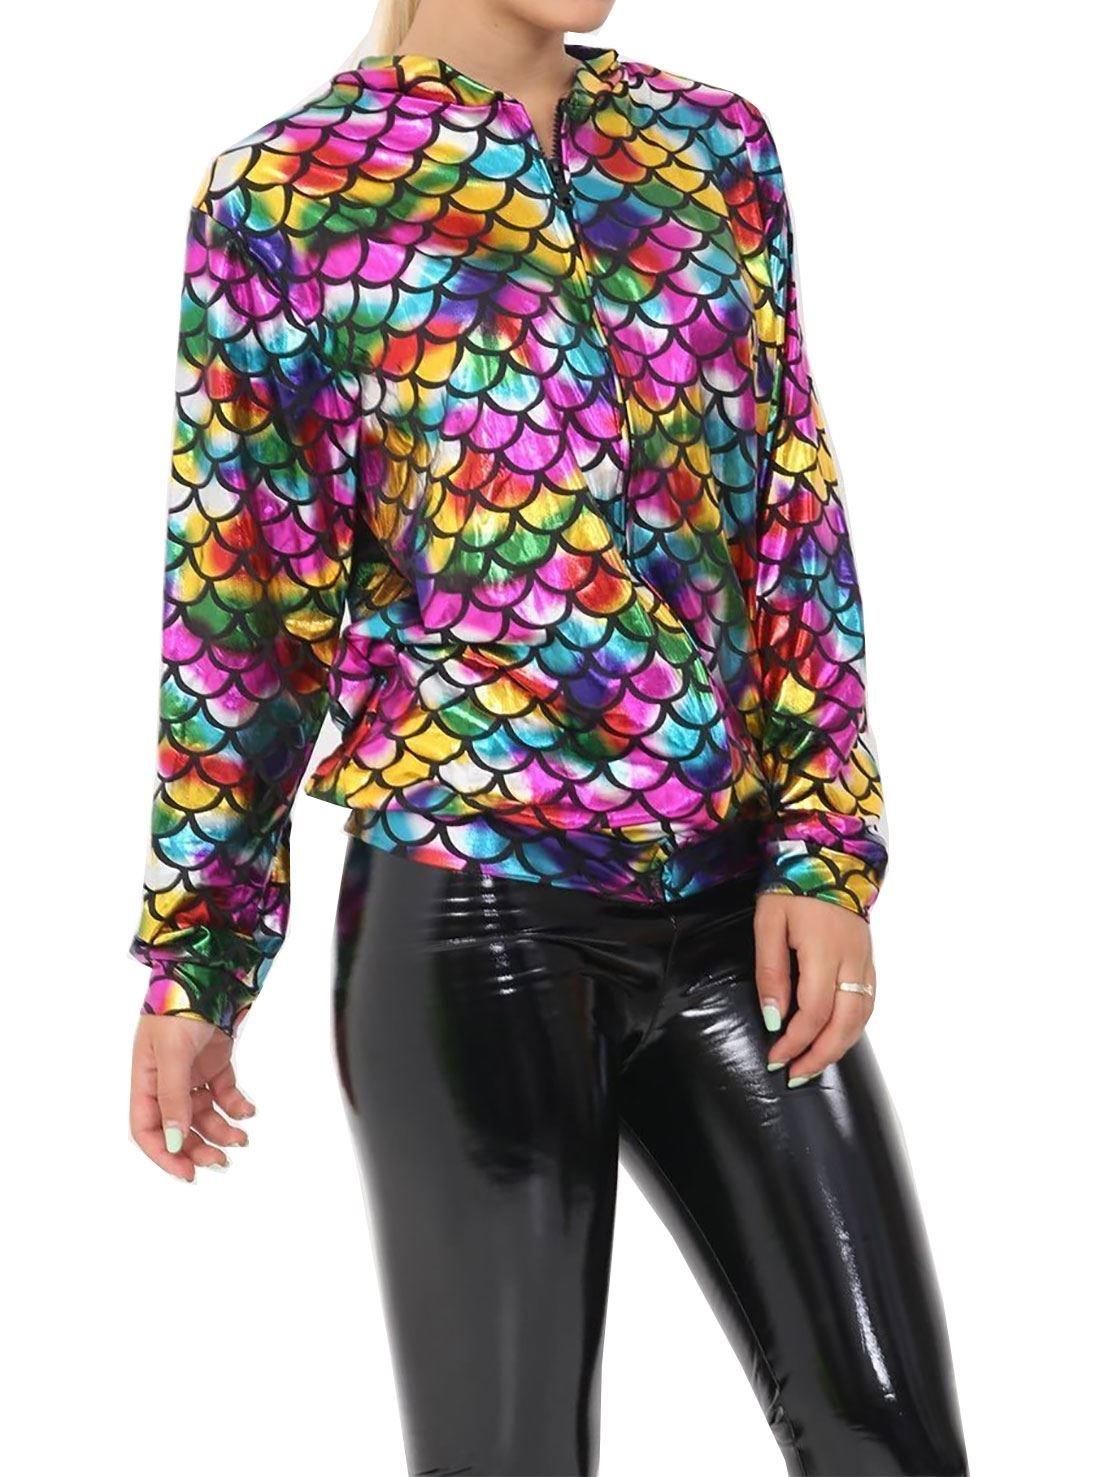 MA ONLINE Ladies Mermaid Fish Scale Metallic Long Sleeve Bomber Jacket Womens Rainbow Zip up Top Coat Rainbow Medium/Large